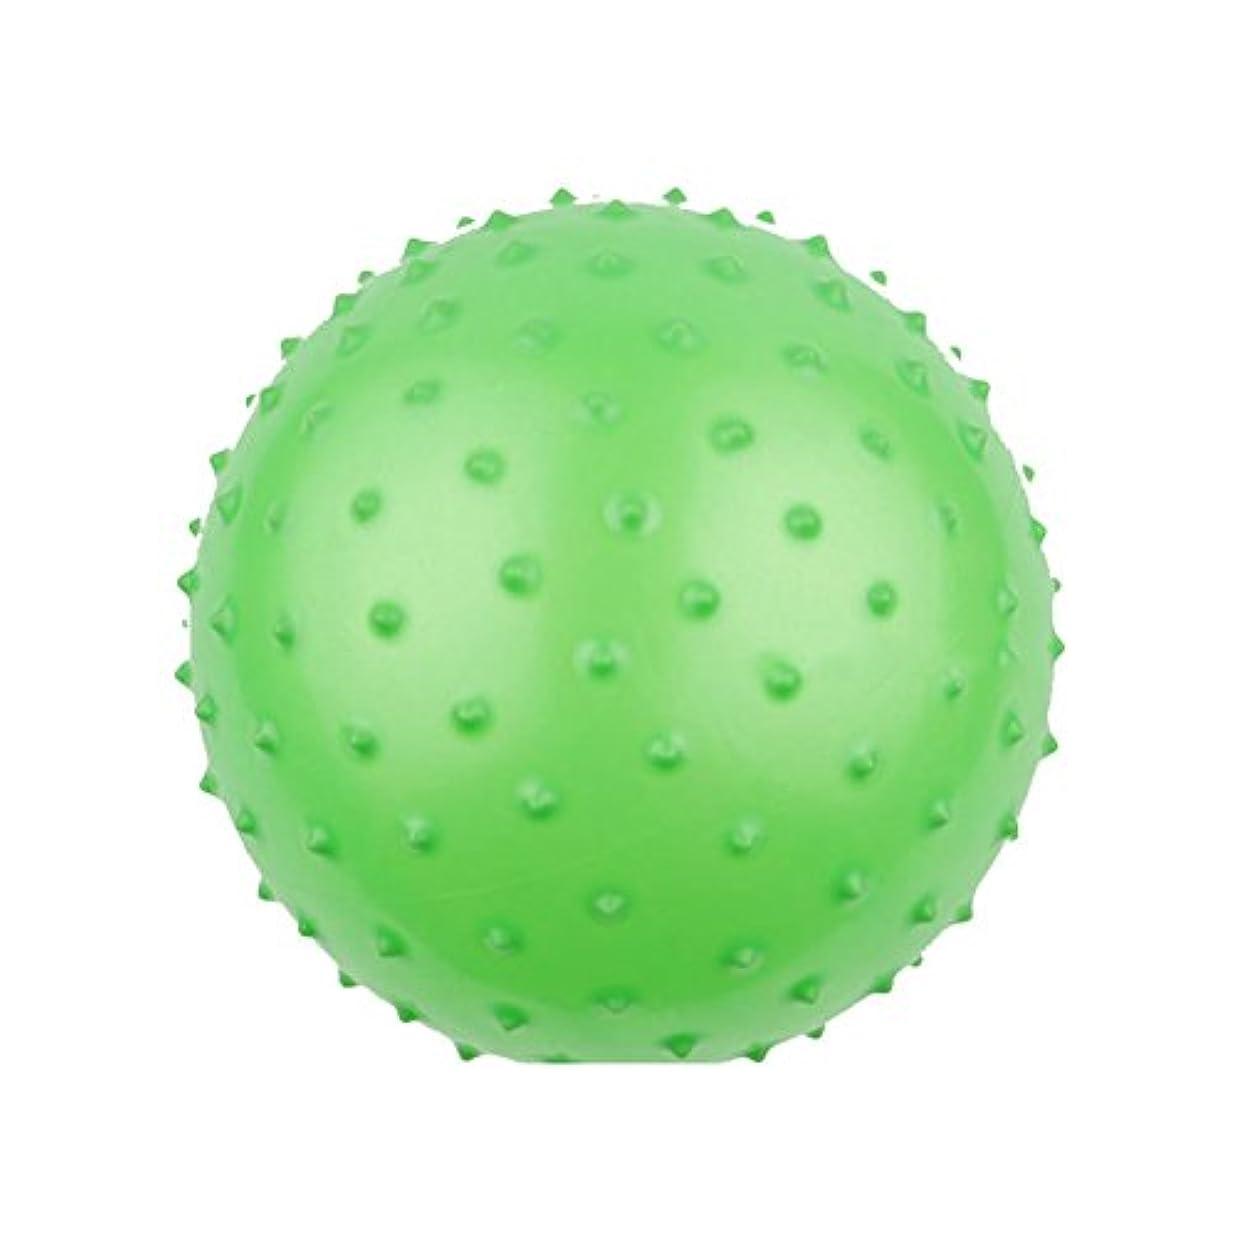 Liebeye 野球ボール 素敵な野球ボールマッサージボールキッズインフレータブルおもちゃのギフト装飾品(ランダムカラー) 28cmマッサージボール